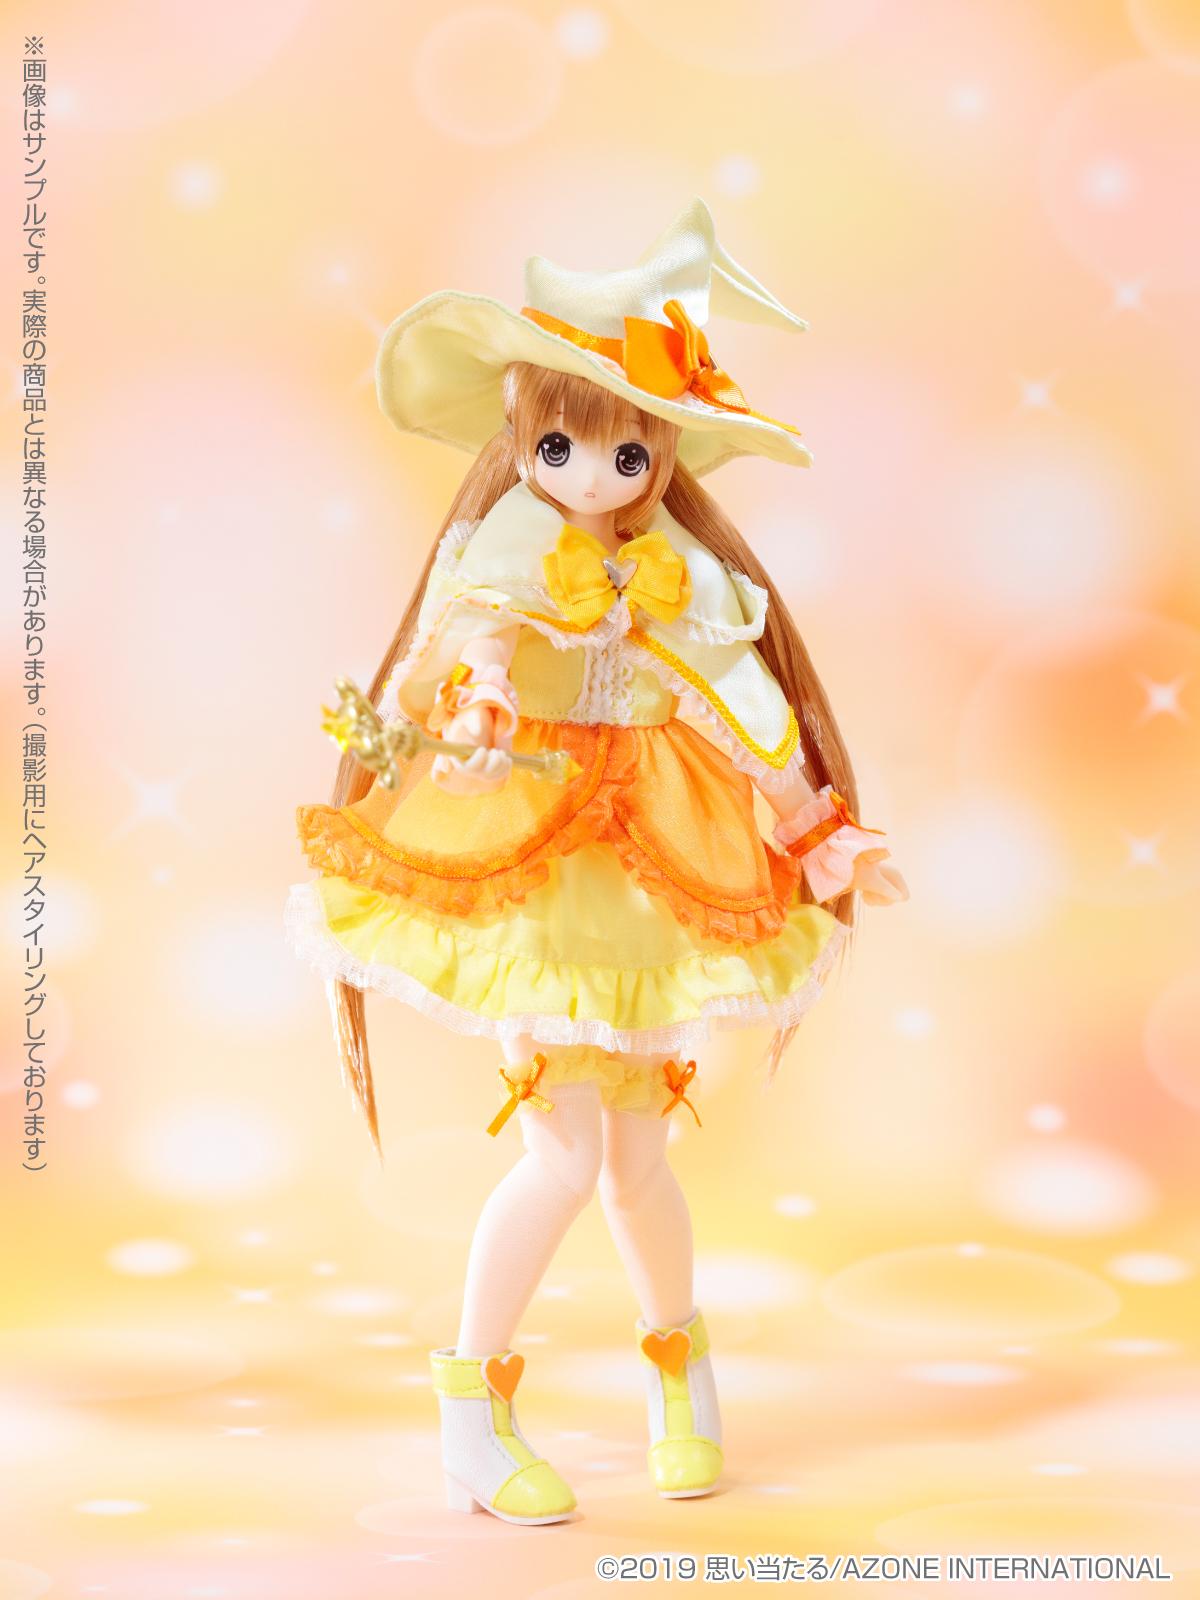 Magical☆CUTE『Pure Heart Chiika(ピュアハート ちいか)』えっくす☆きゅーと 1/6 完成品ドール-007